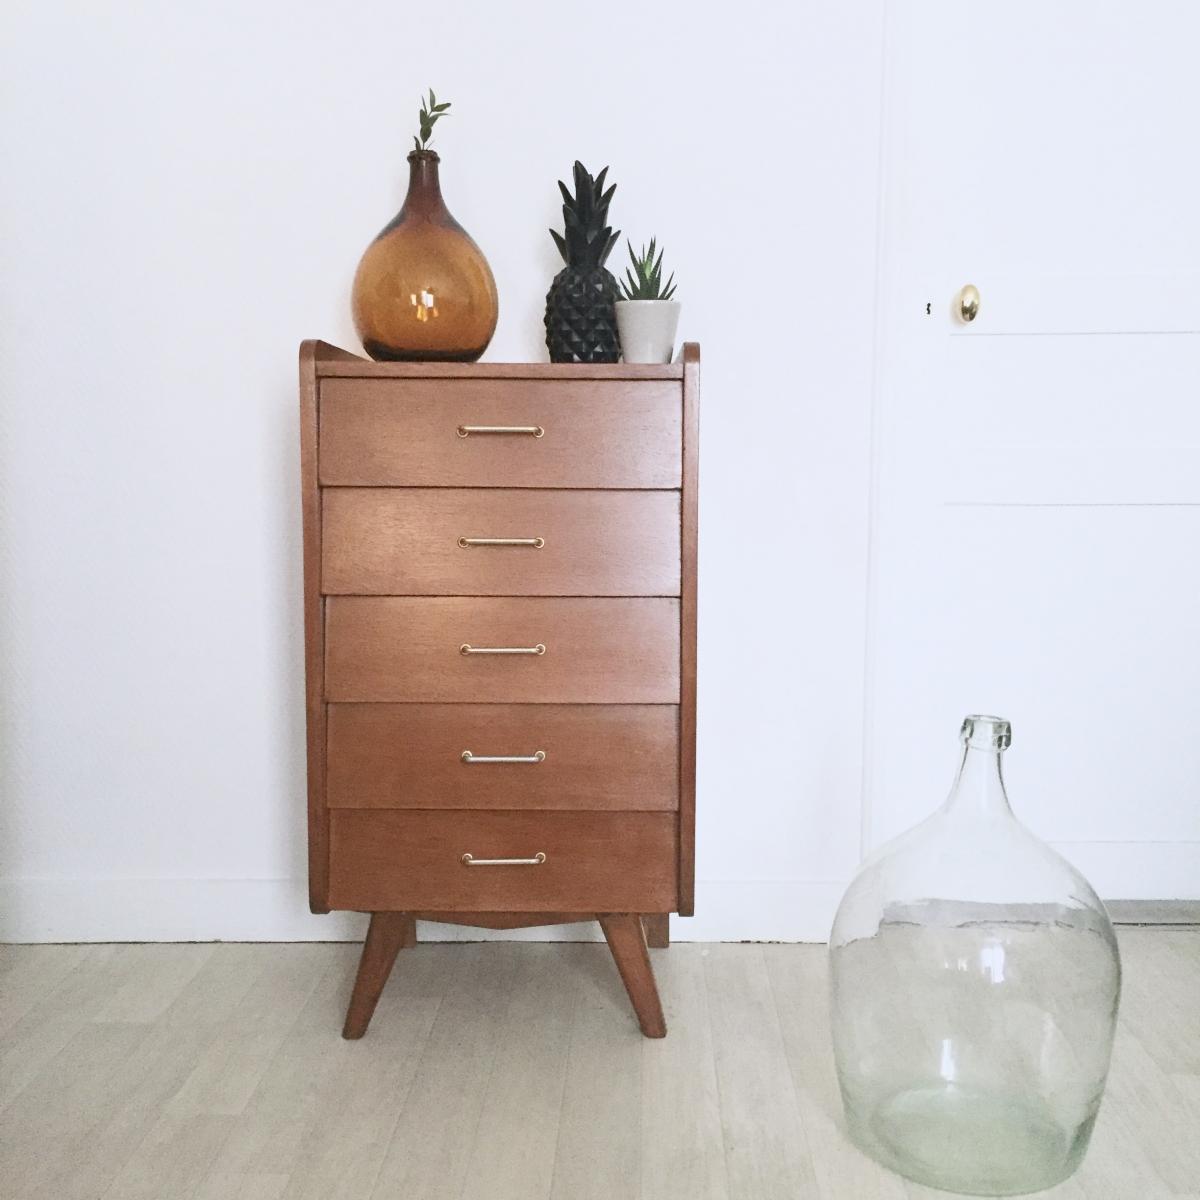 chiffonnier commode vintage luckyfind. Black Bedroom Furniture Sets. Home Design Ideas